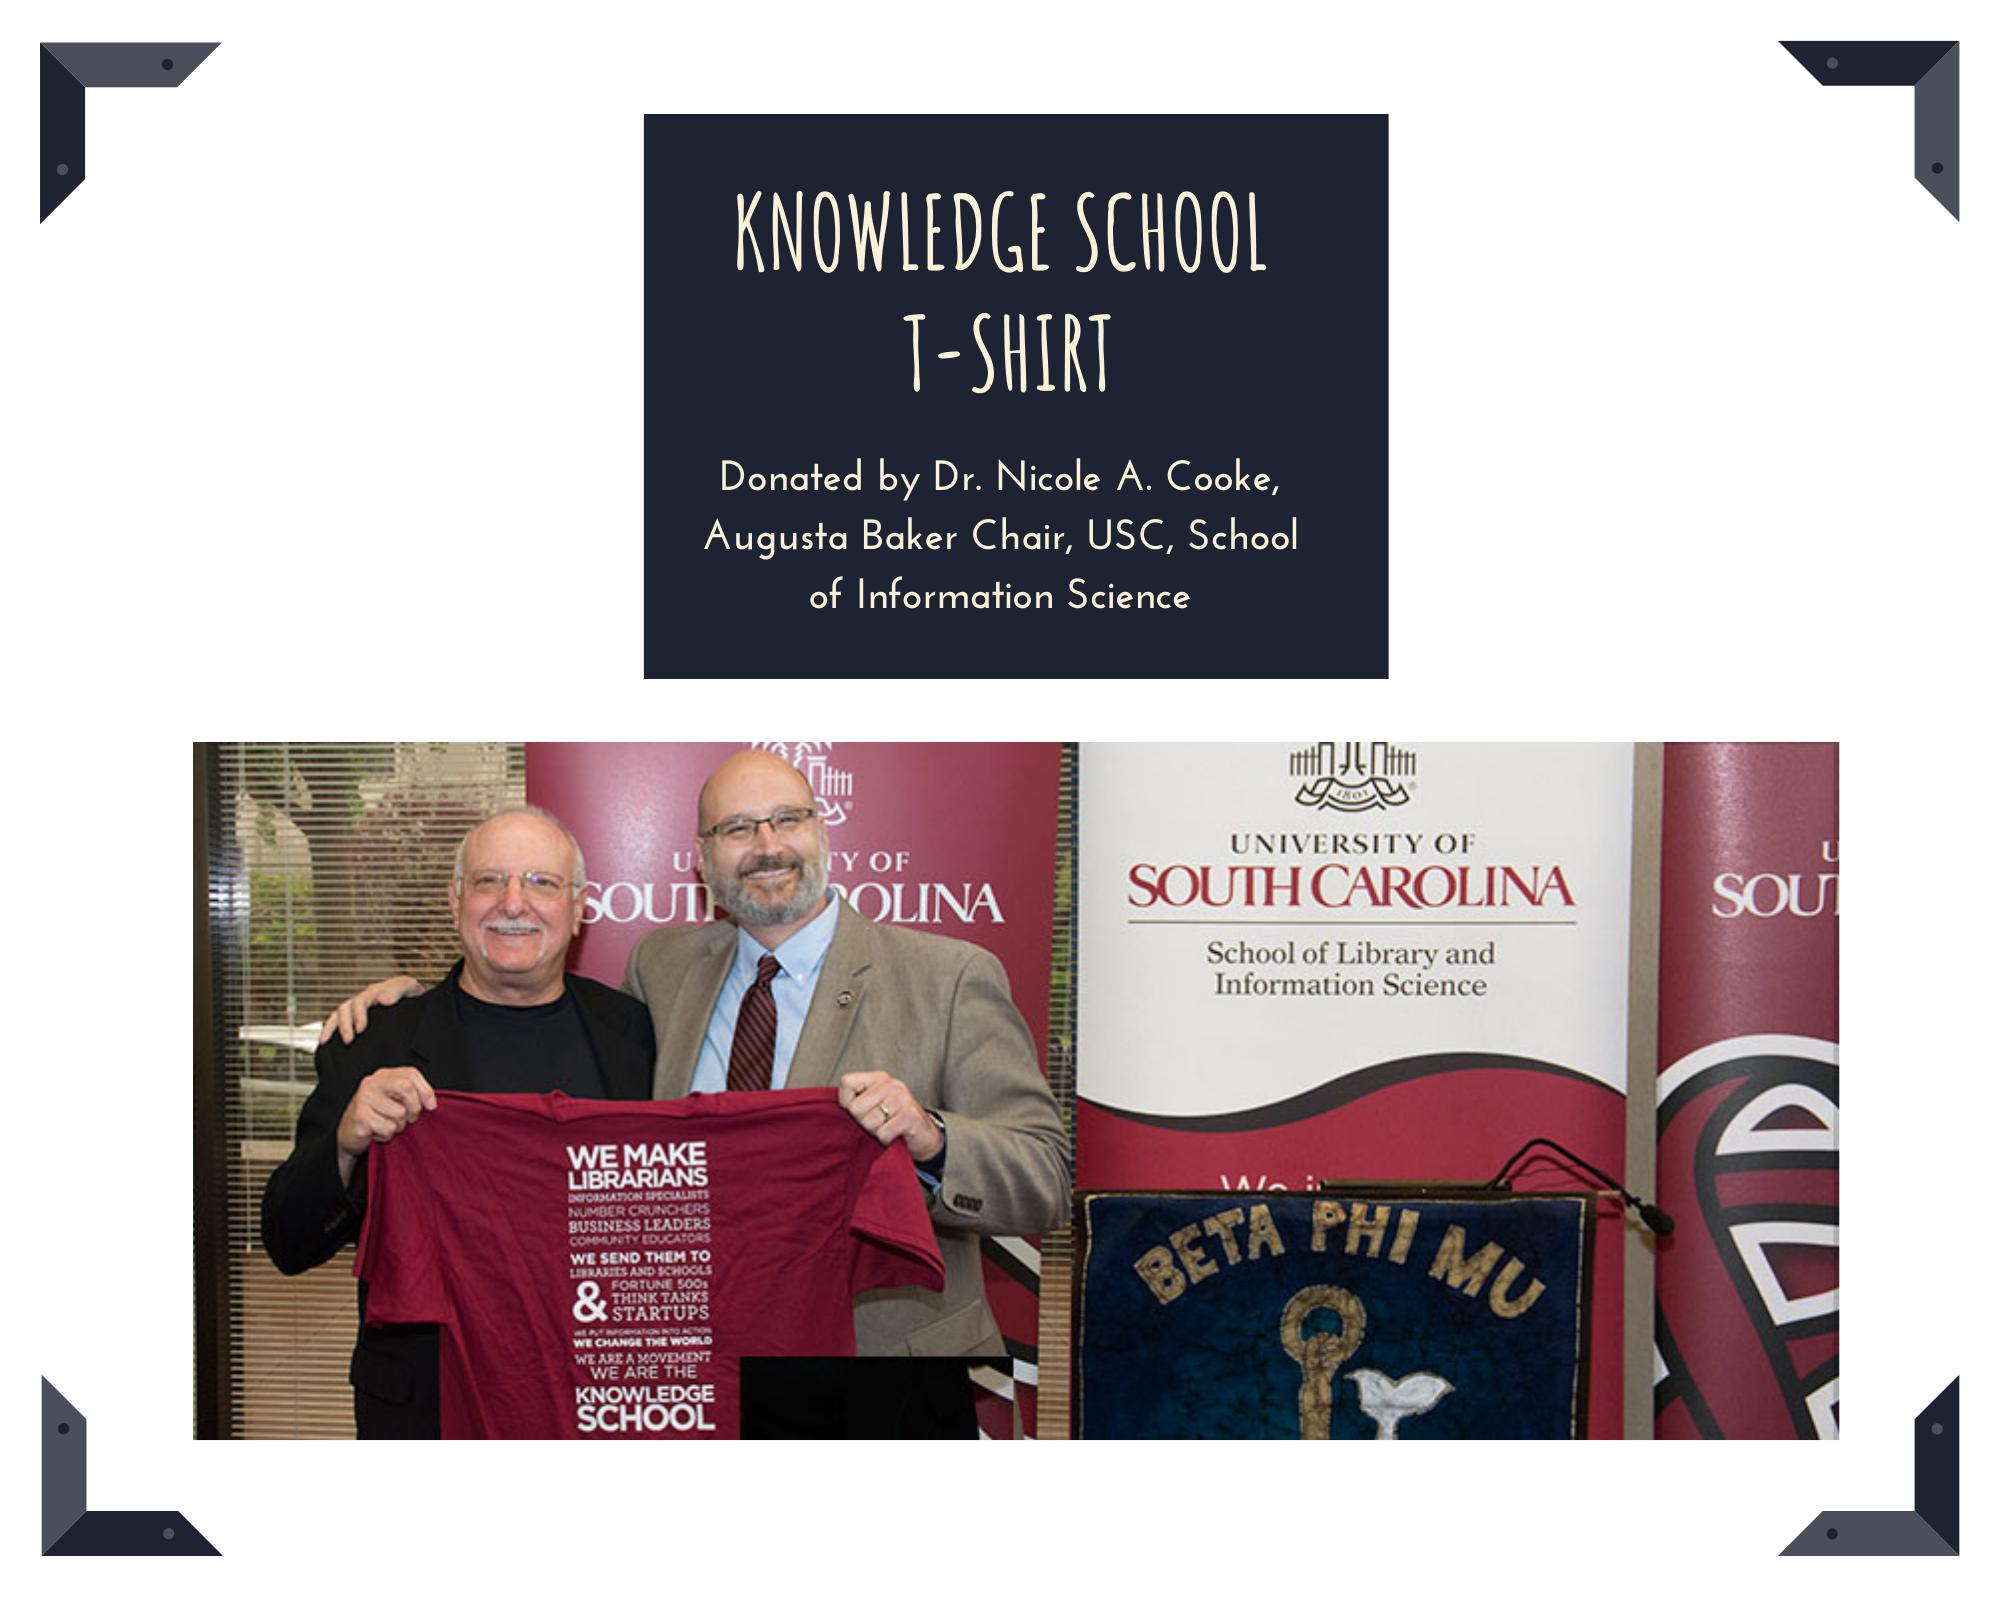 Knowledge School t-shirt